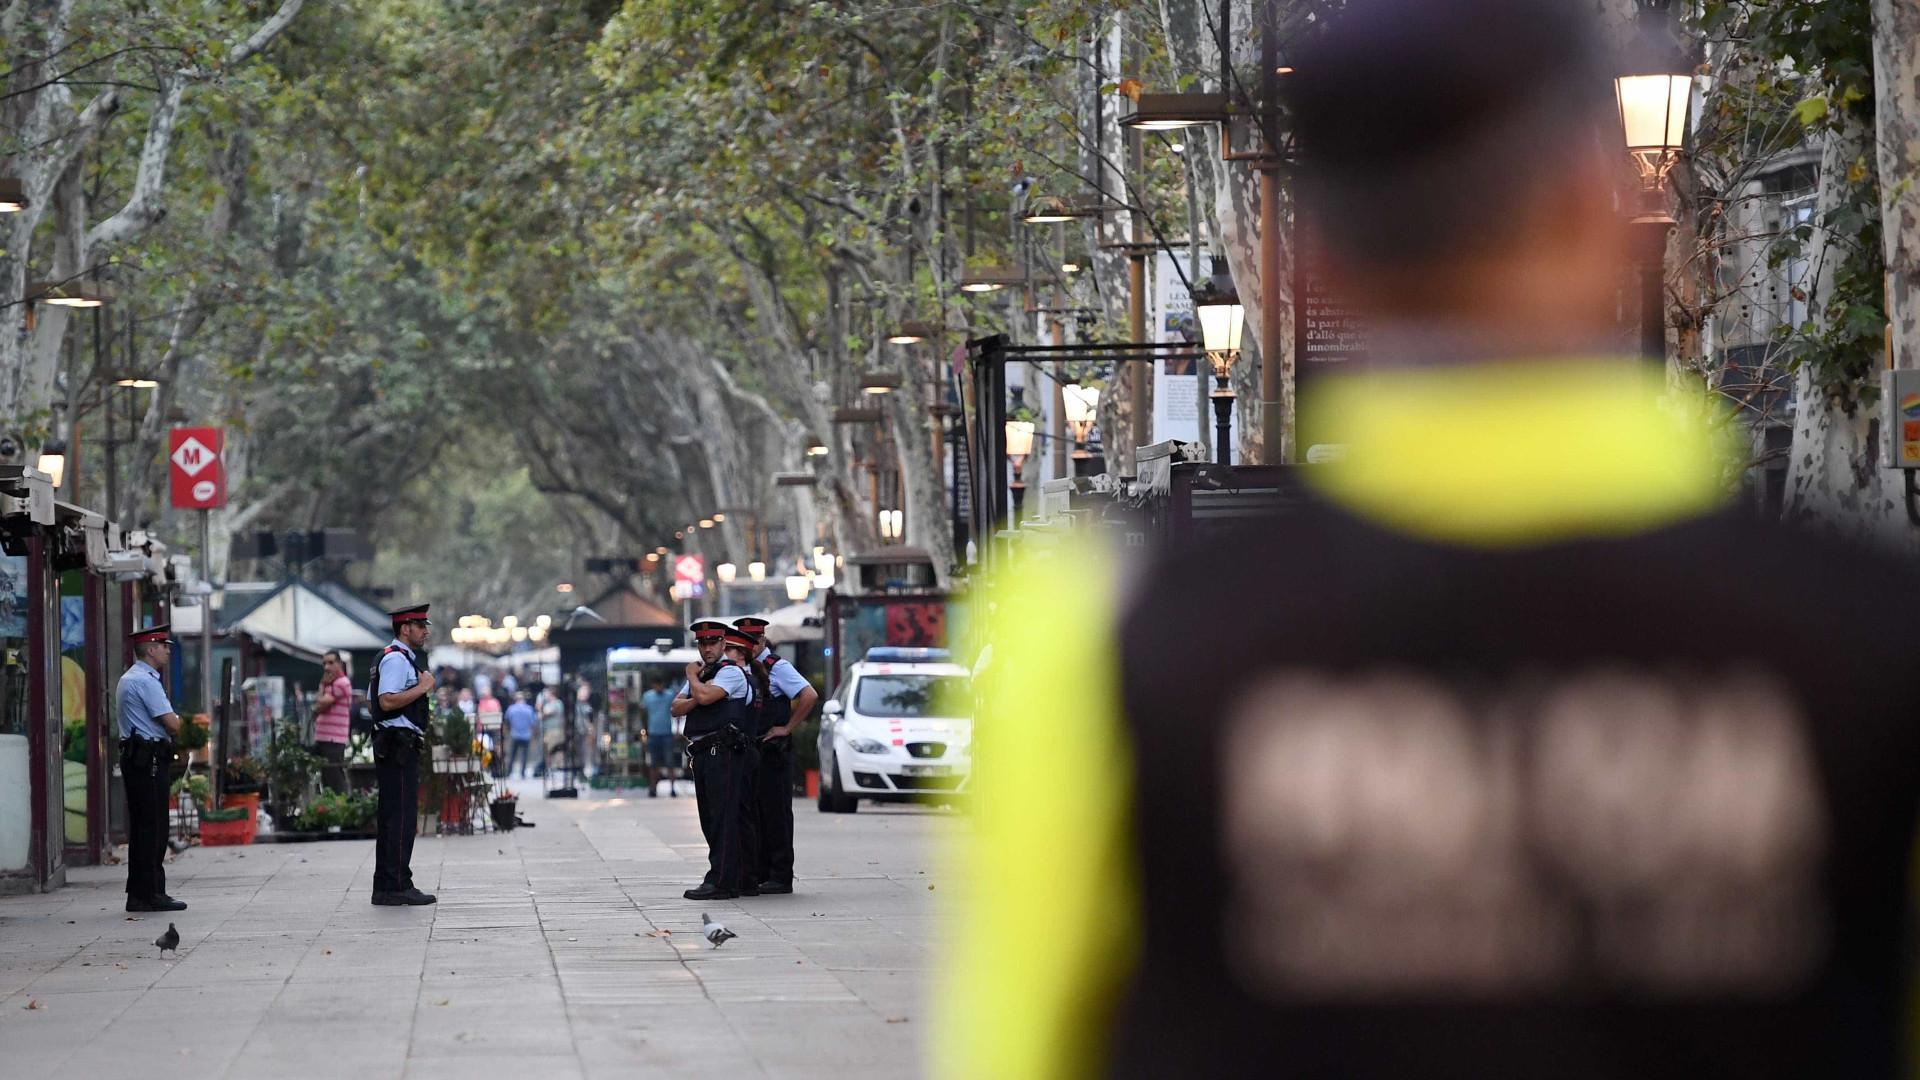 Desmantelada célula jihadista, diz ministro do Interior